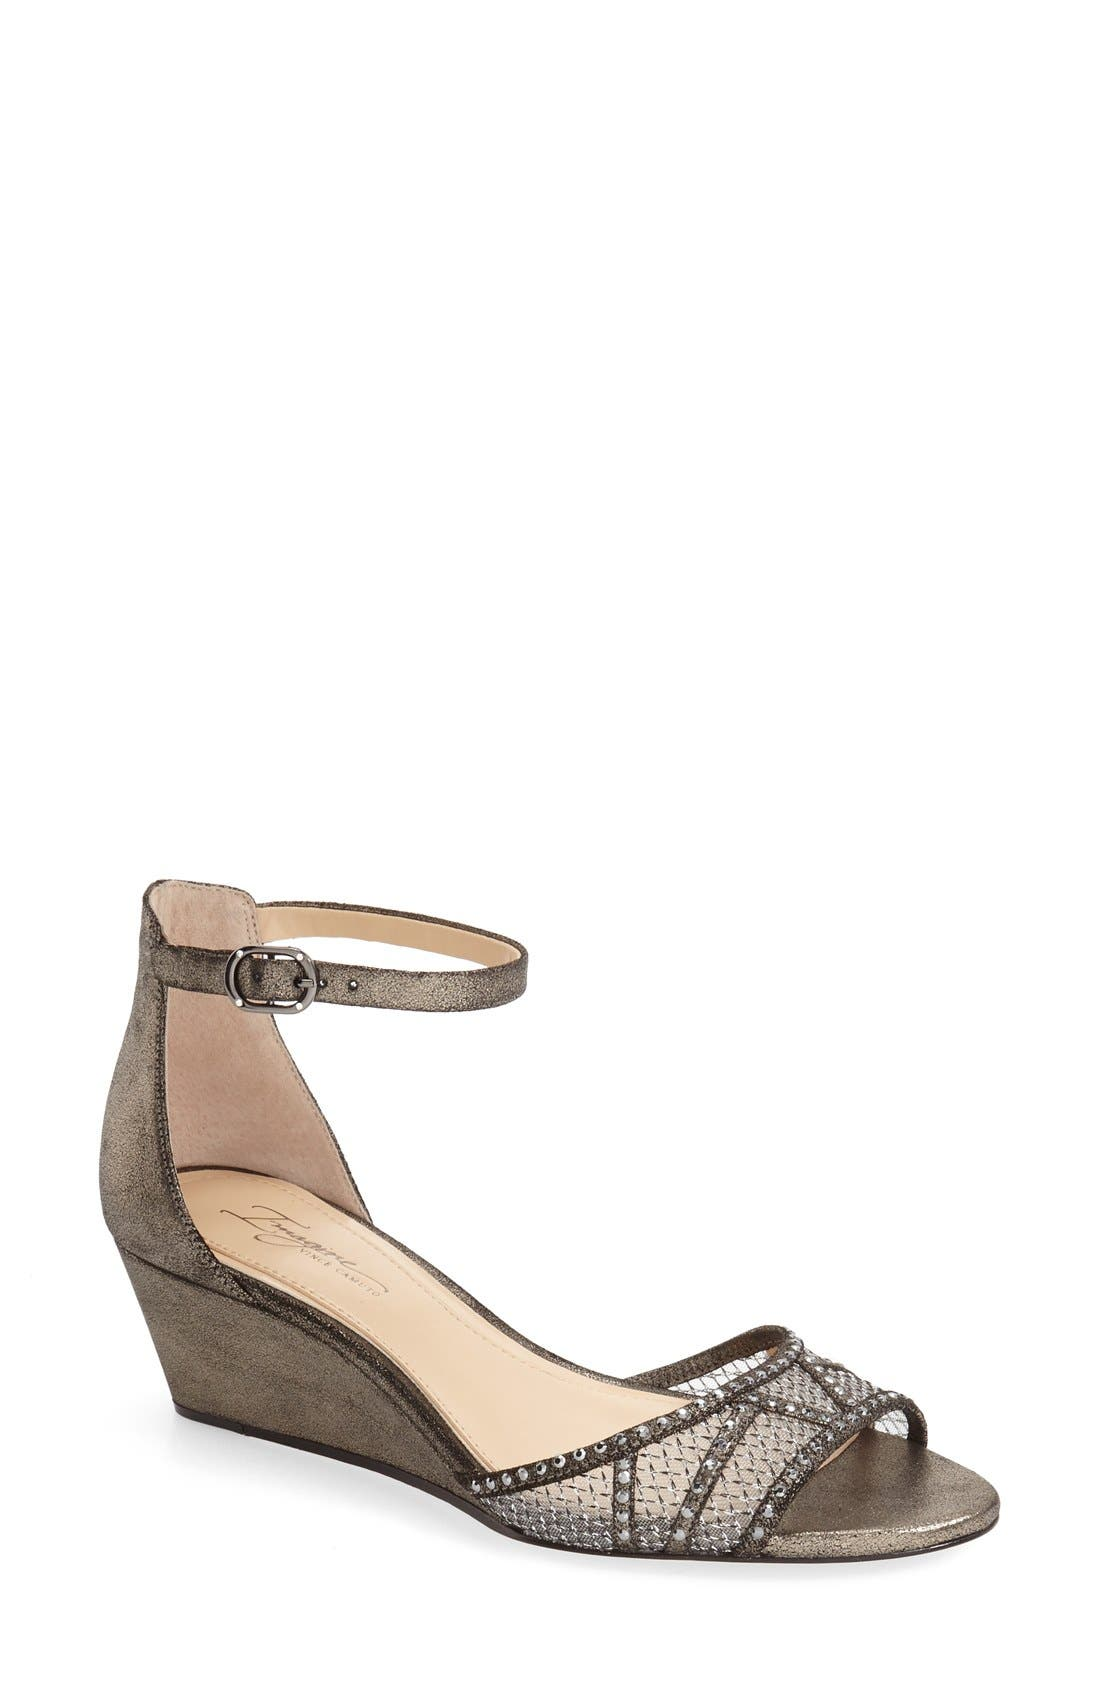 'Joan' Studded Wedge Sandal,                         Main,                         color,